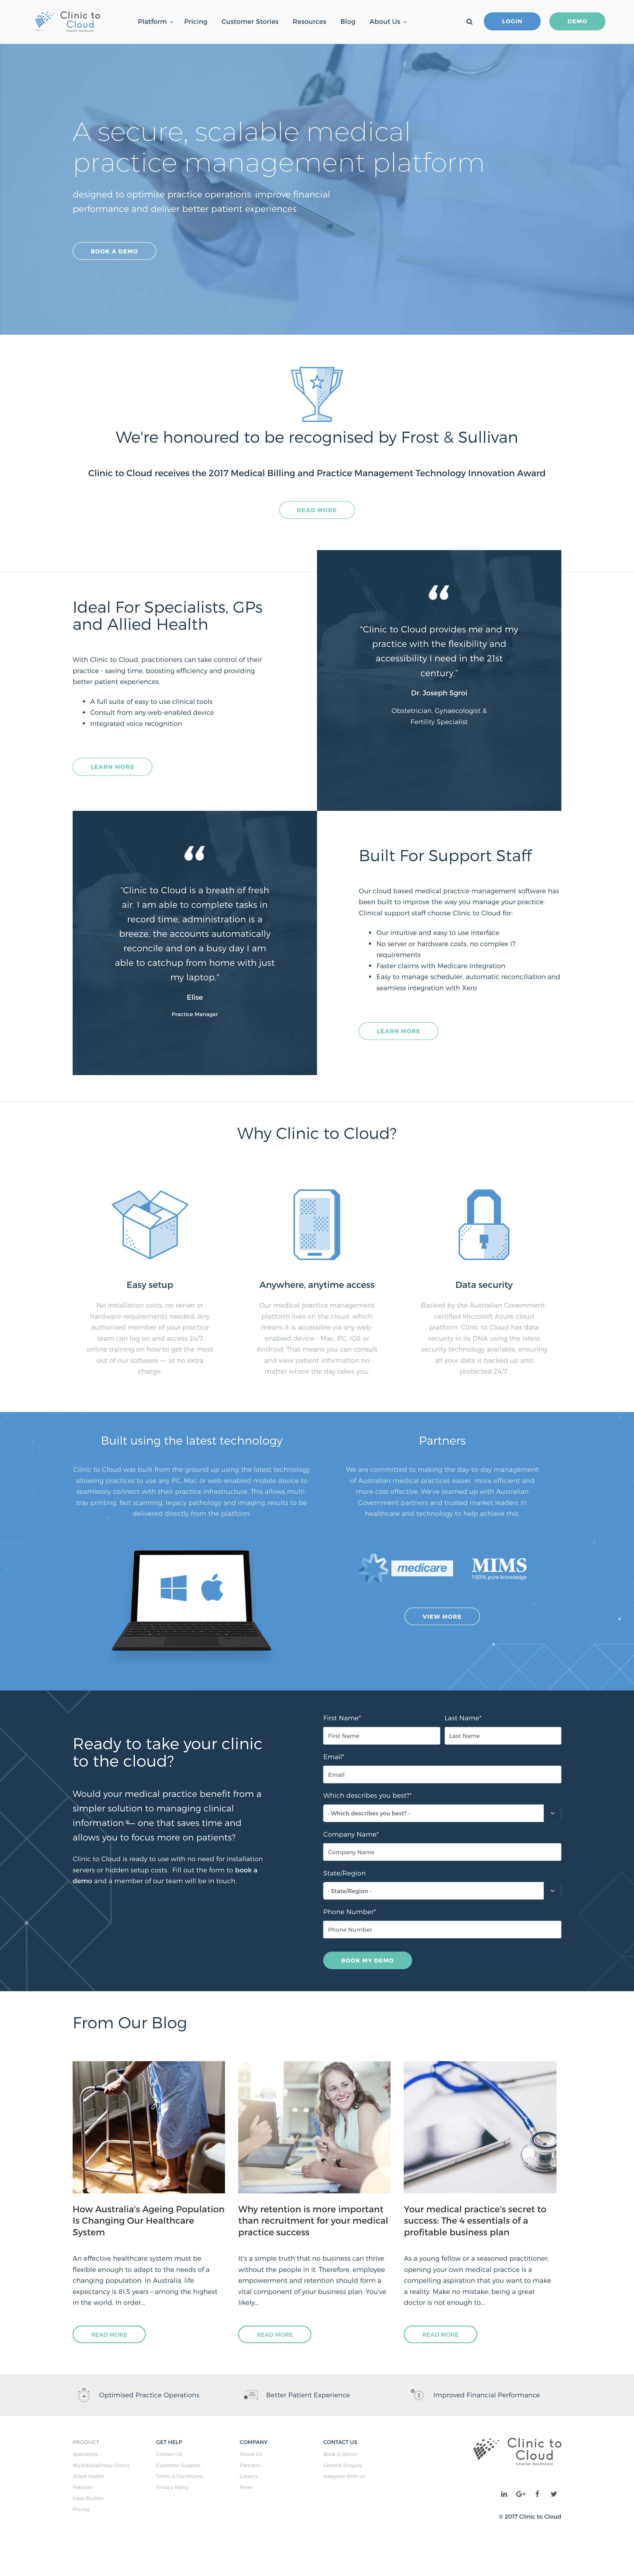 Clinic to Cloud Website Screenshot